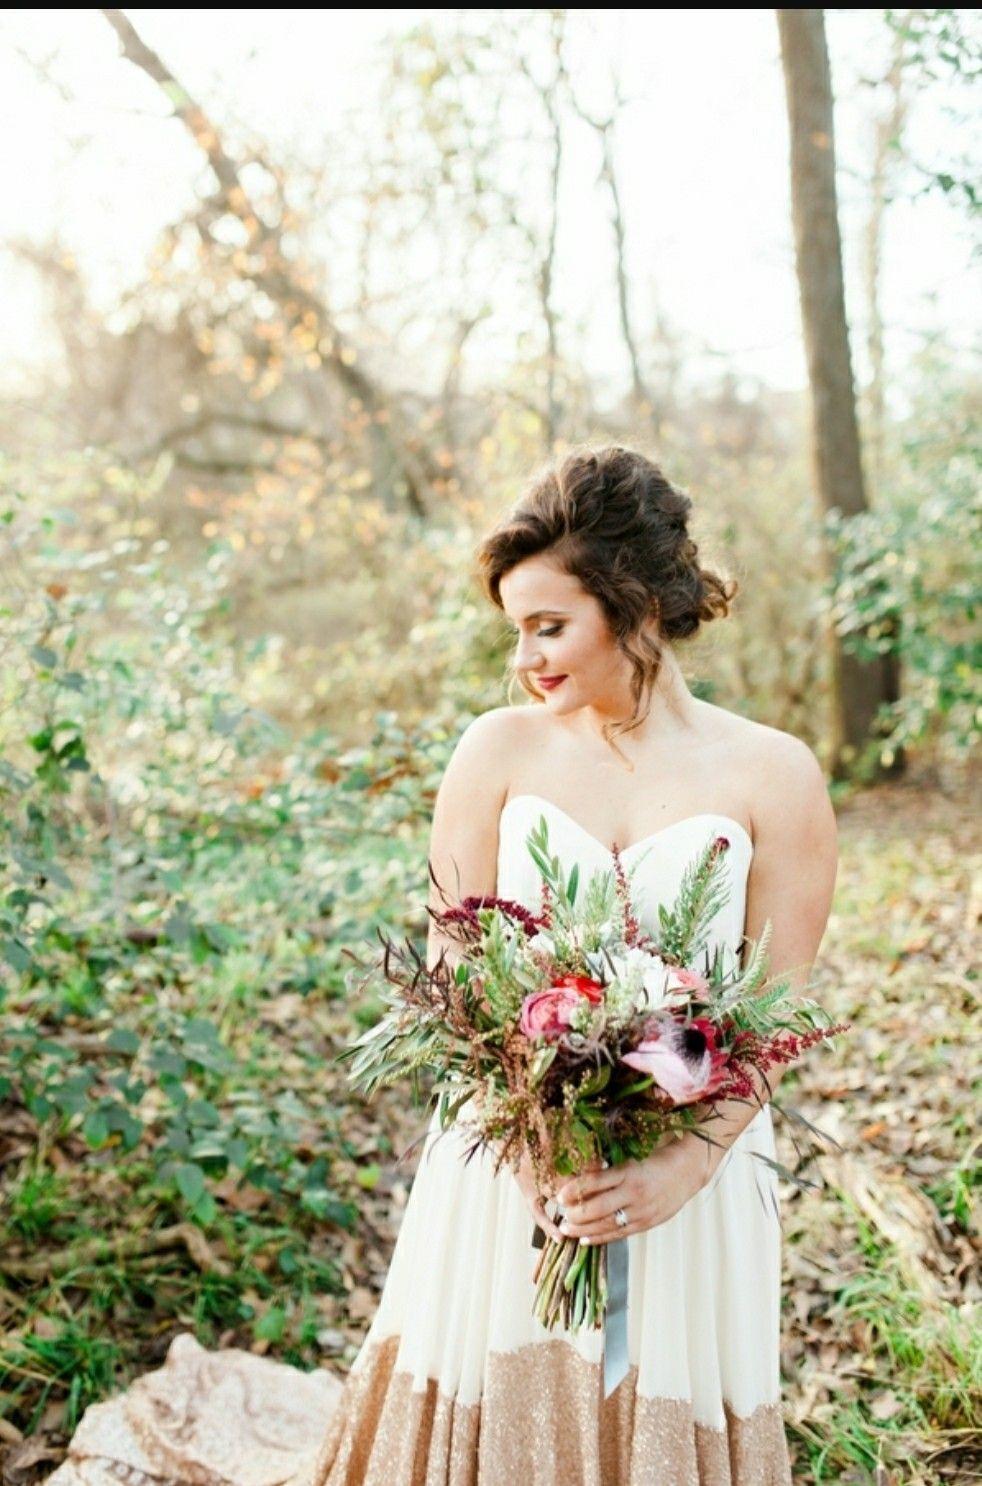 Boho glam wedding inspiration jessica sparks photography